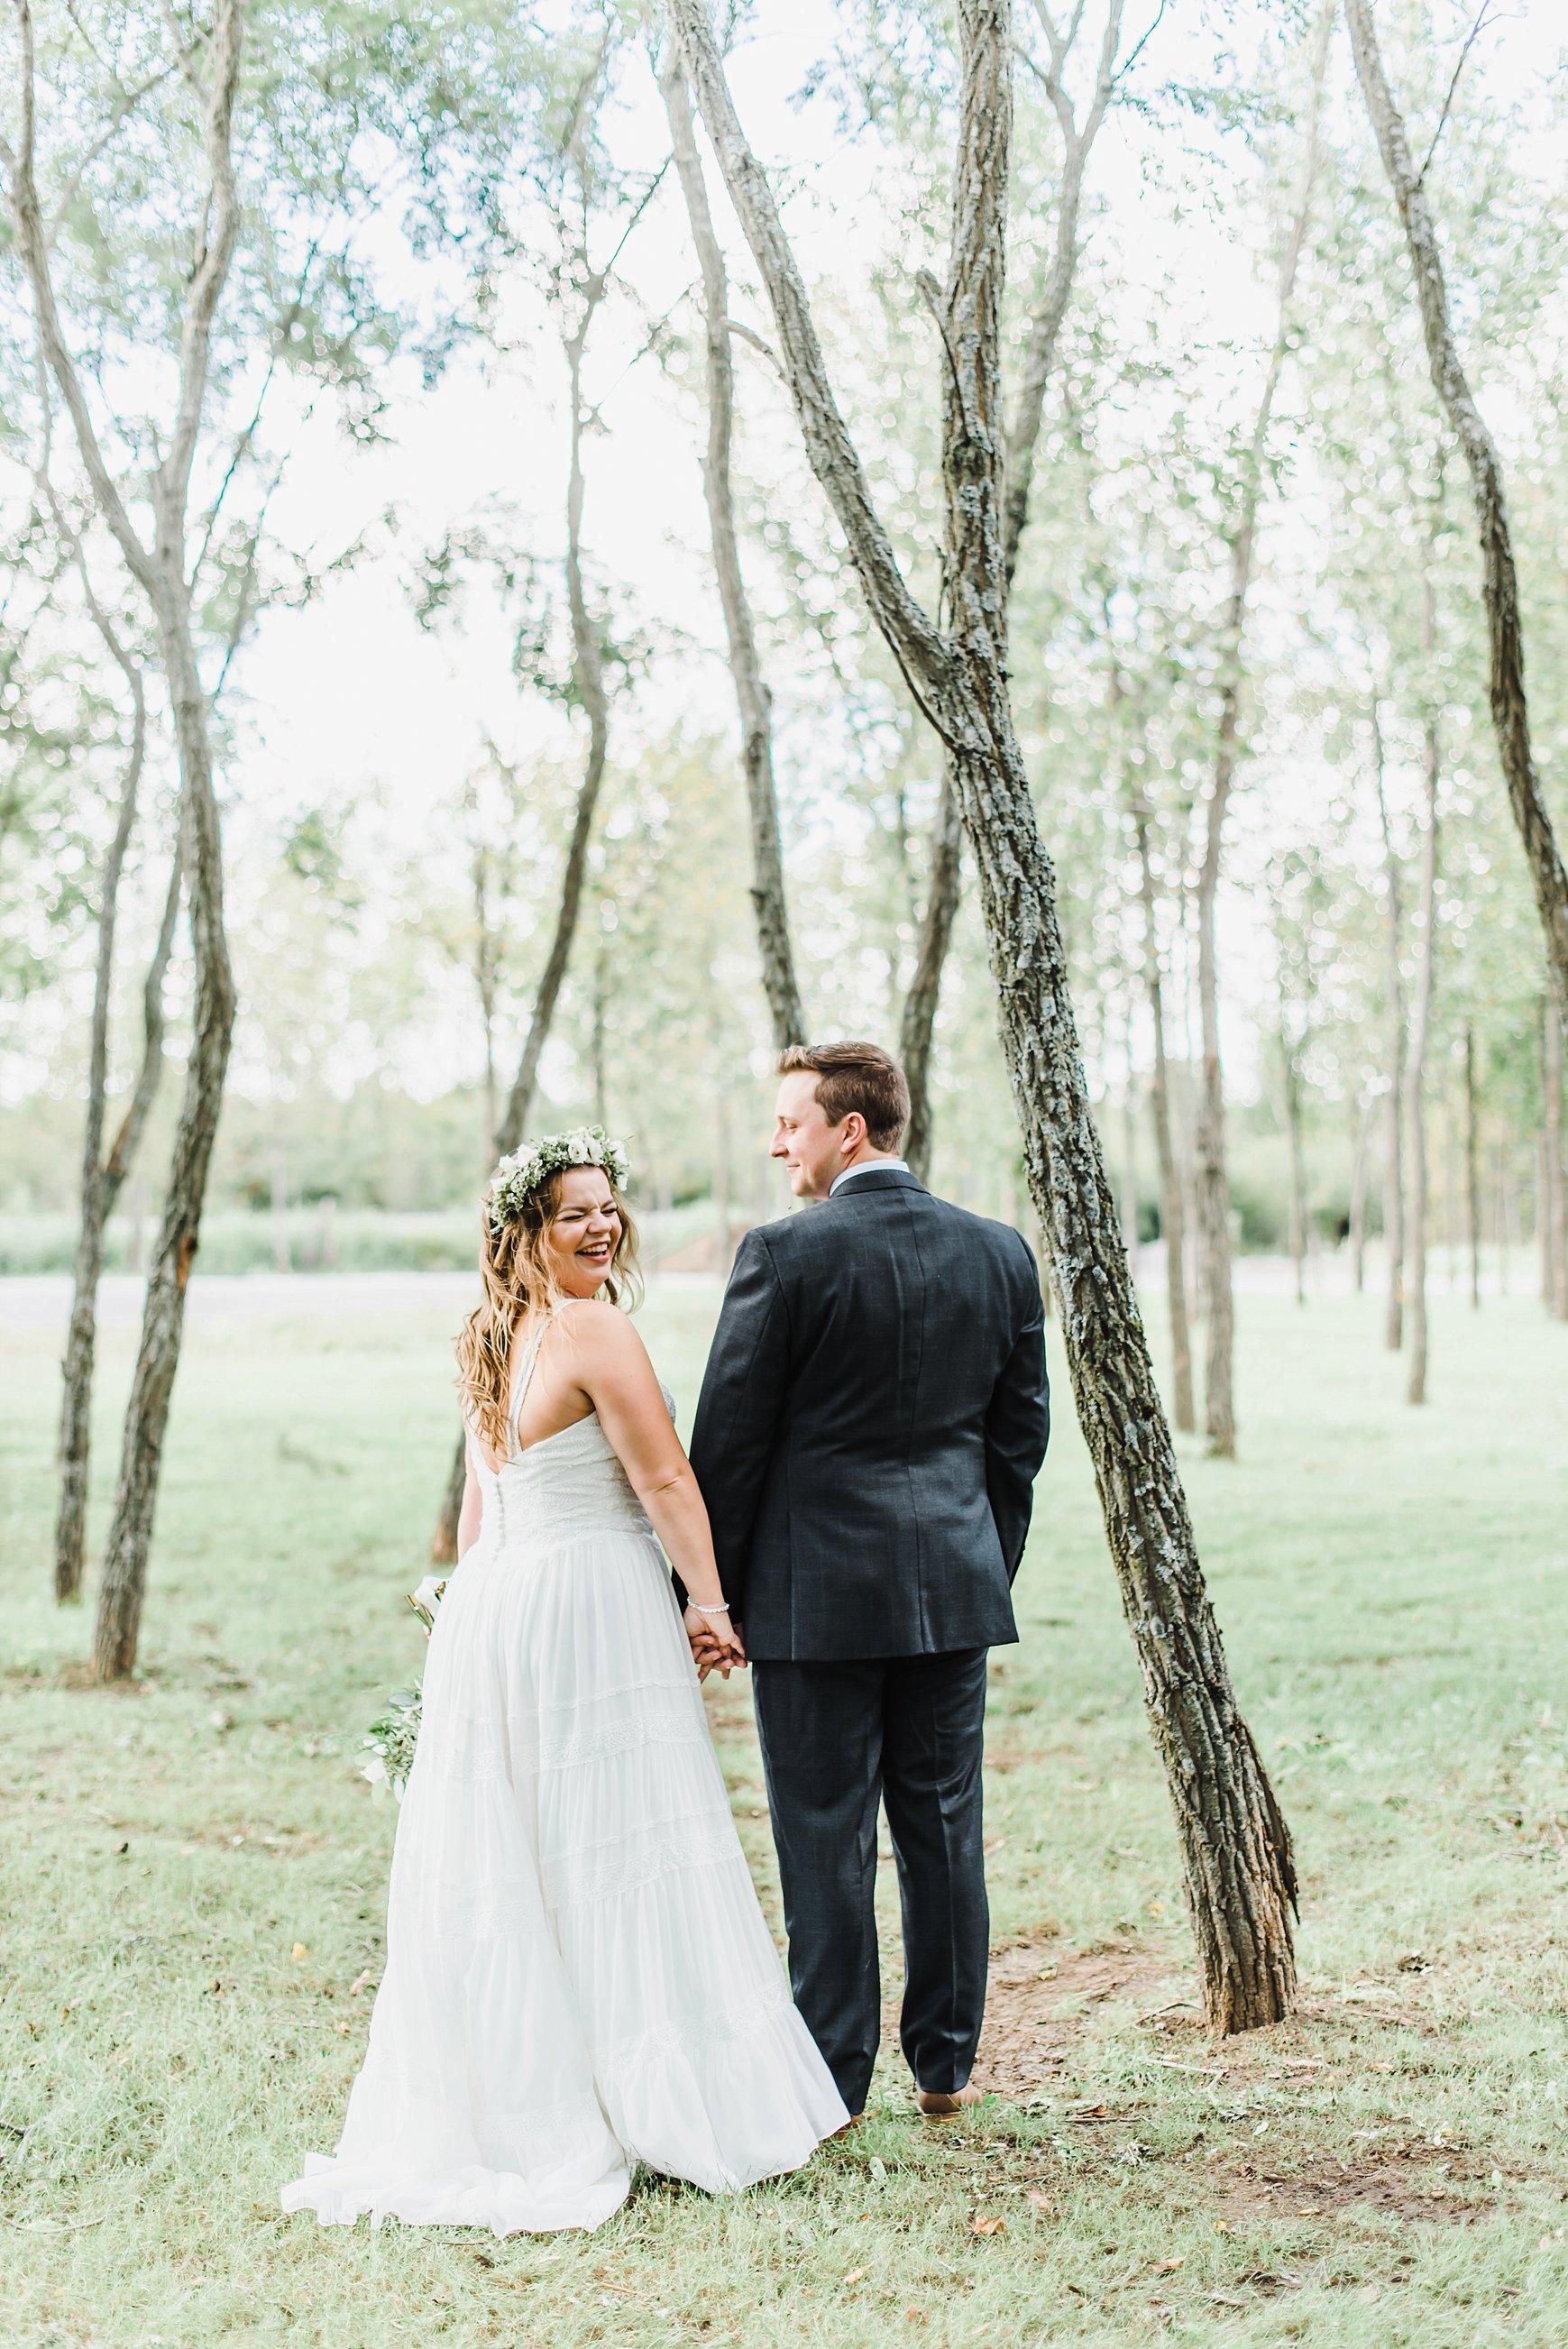 light airy indie fine art ottawa wedding photographer | Ali and Batoul Photography_1097.jpg